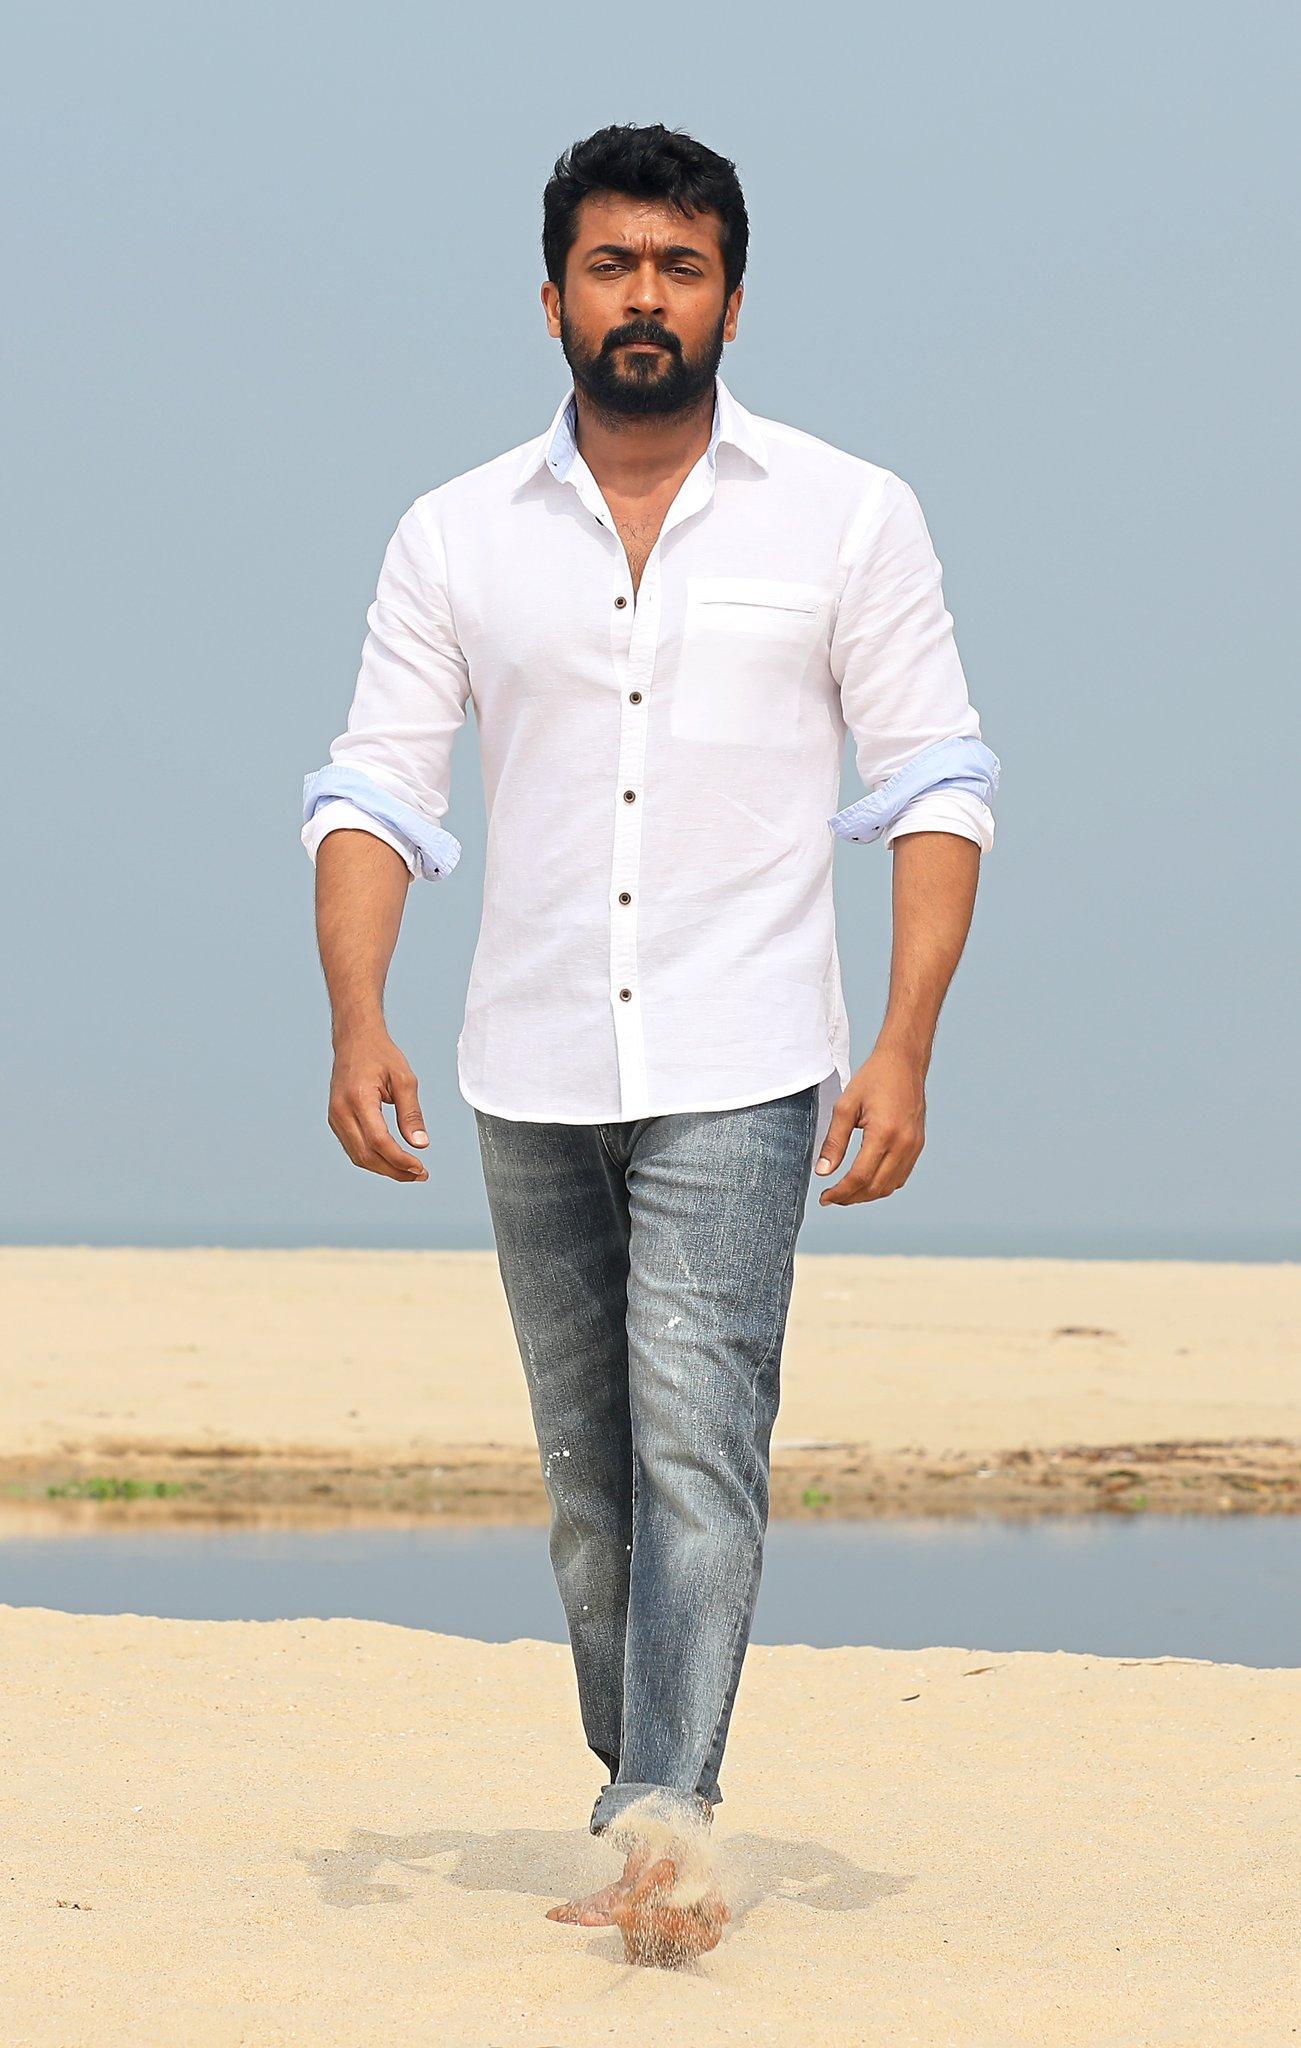 Actor Suriya Body Measurements, Height, & Weight: